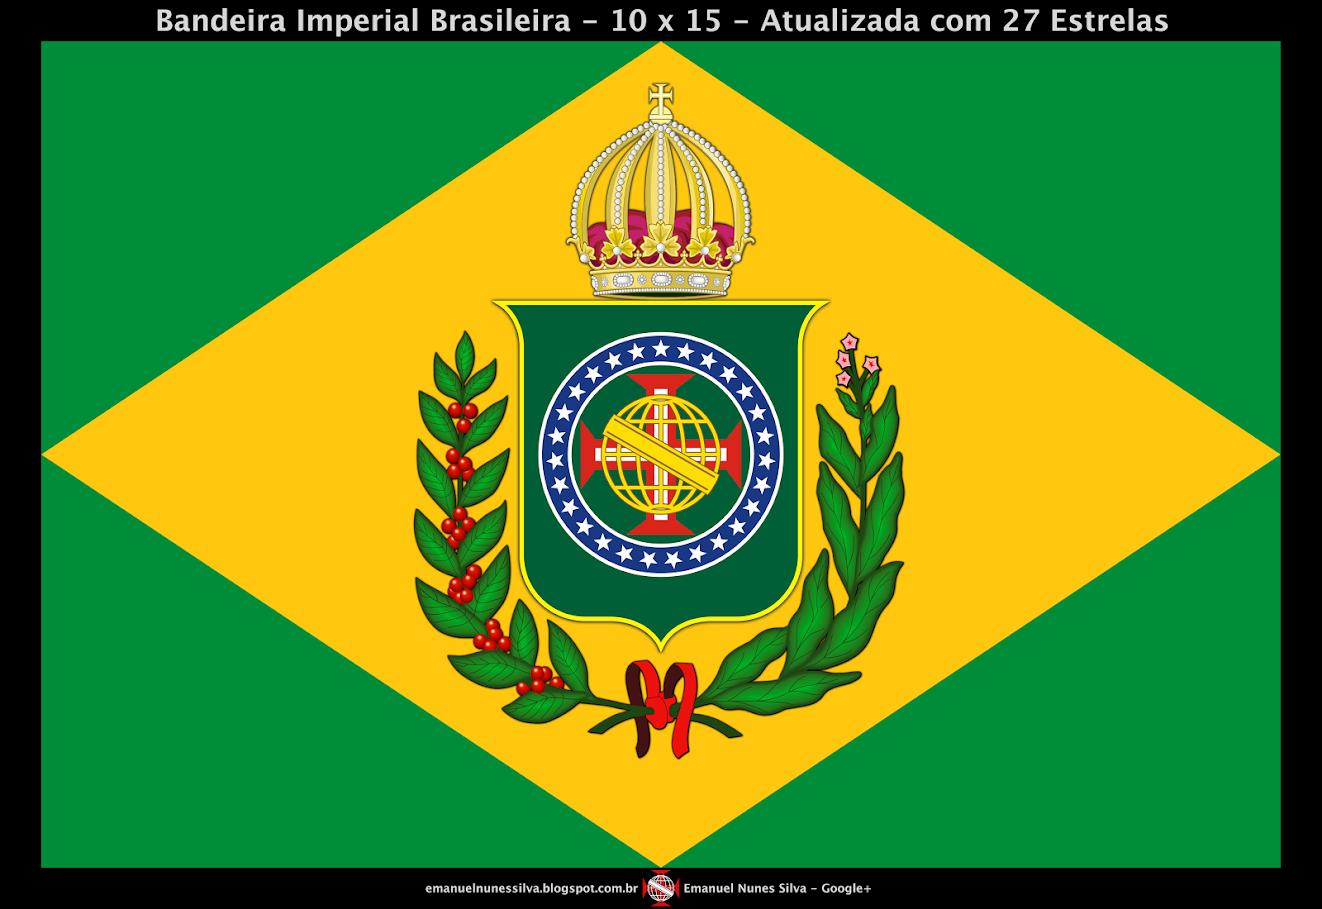 Bandeira do Brasil Imperial - Modelo (10 X 15) - Atualizada - Crédito: Emanuel Nunes Silva